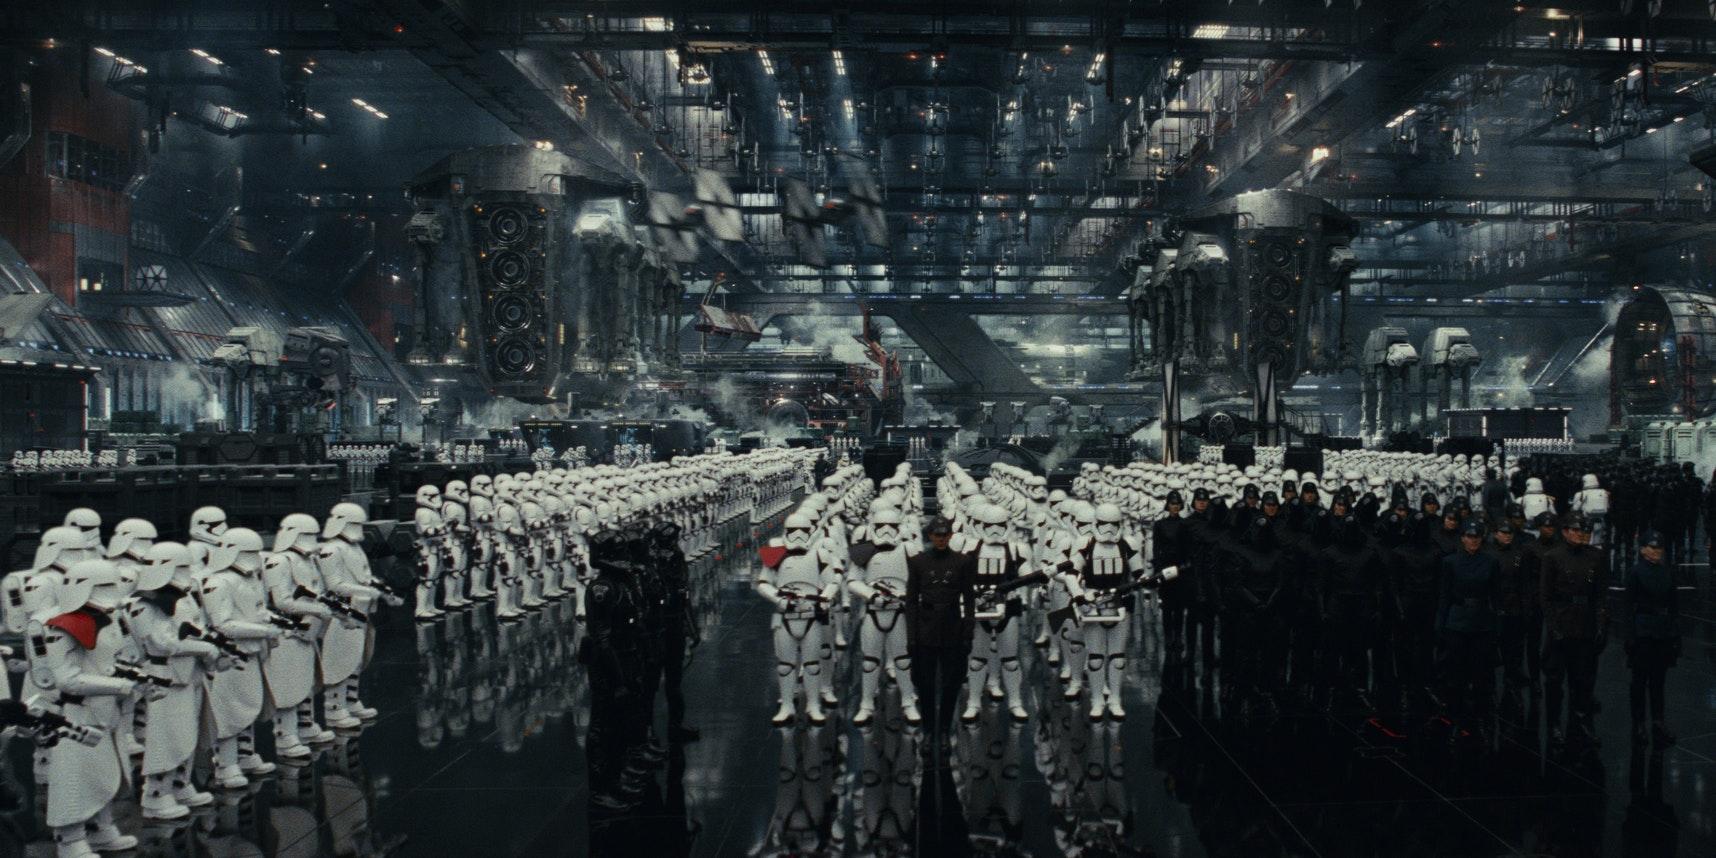 Richard E. Grant's New 'Star Wars: Episode IX' Character Teases a Spoiler